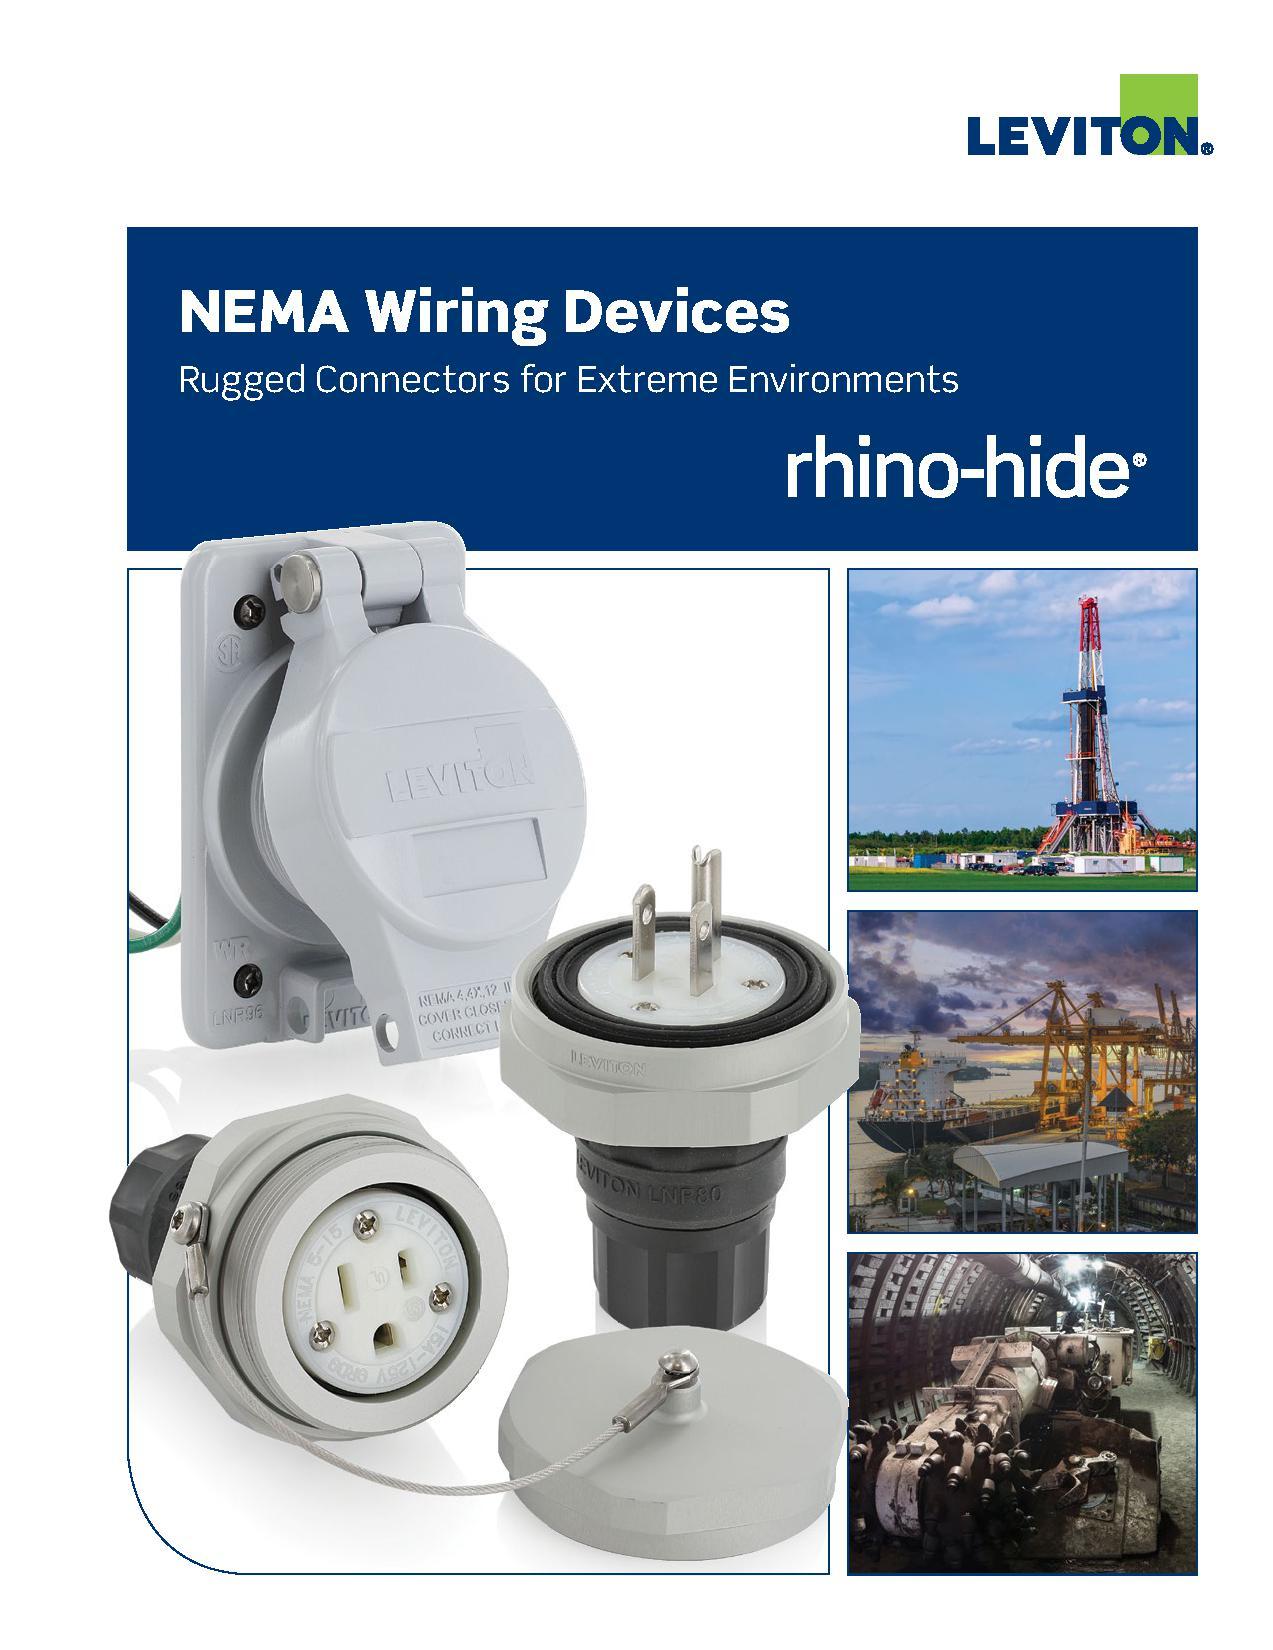 Leviton Rhino-Hide NEMA Wiring Devices   AJB Sales